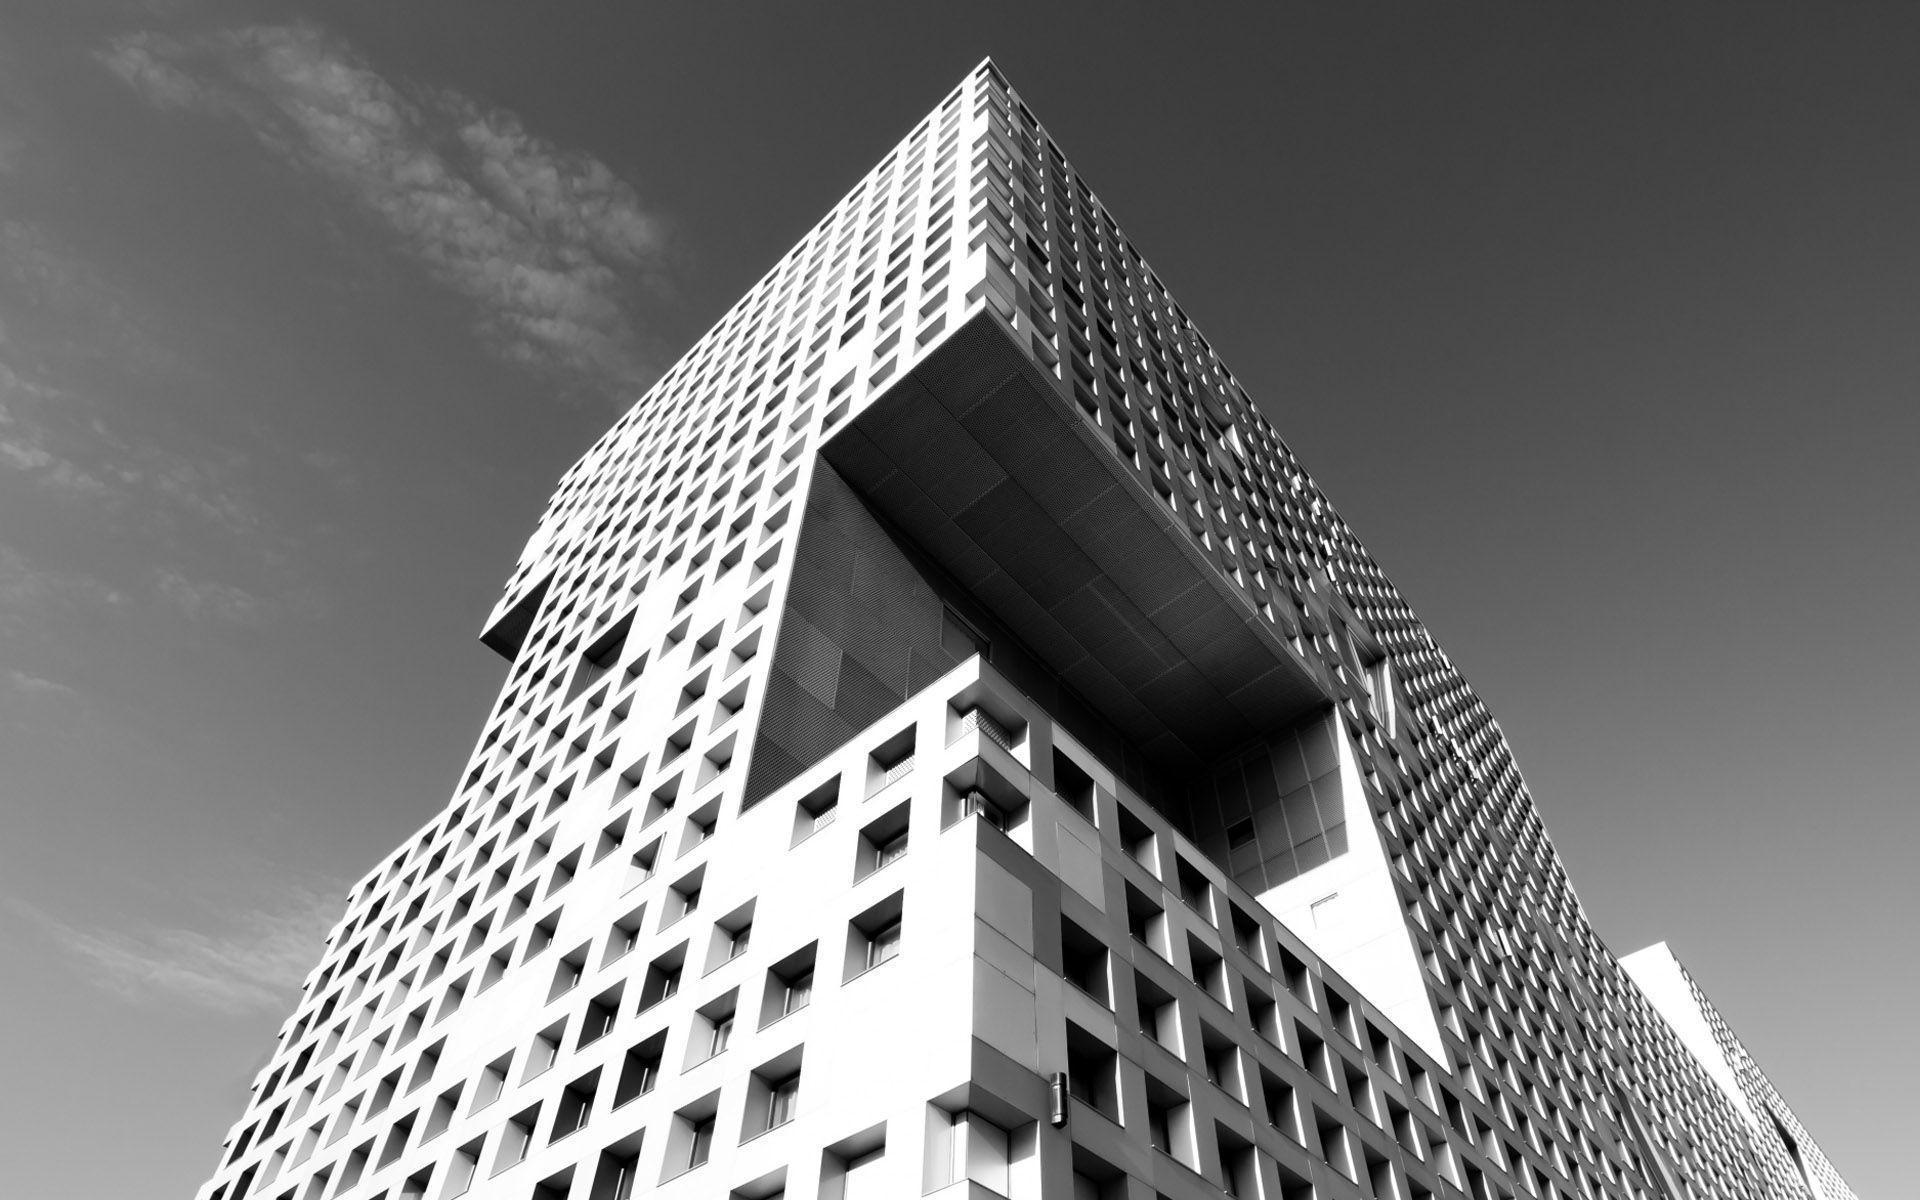 Building Architecture Wallpaper 587 1920x1200 - uMad.com